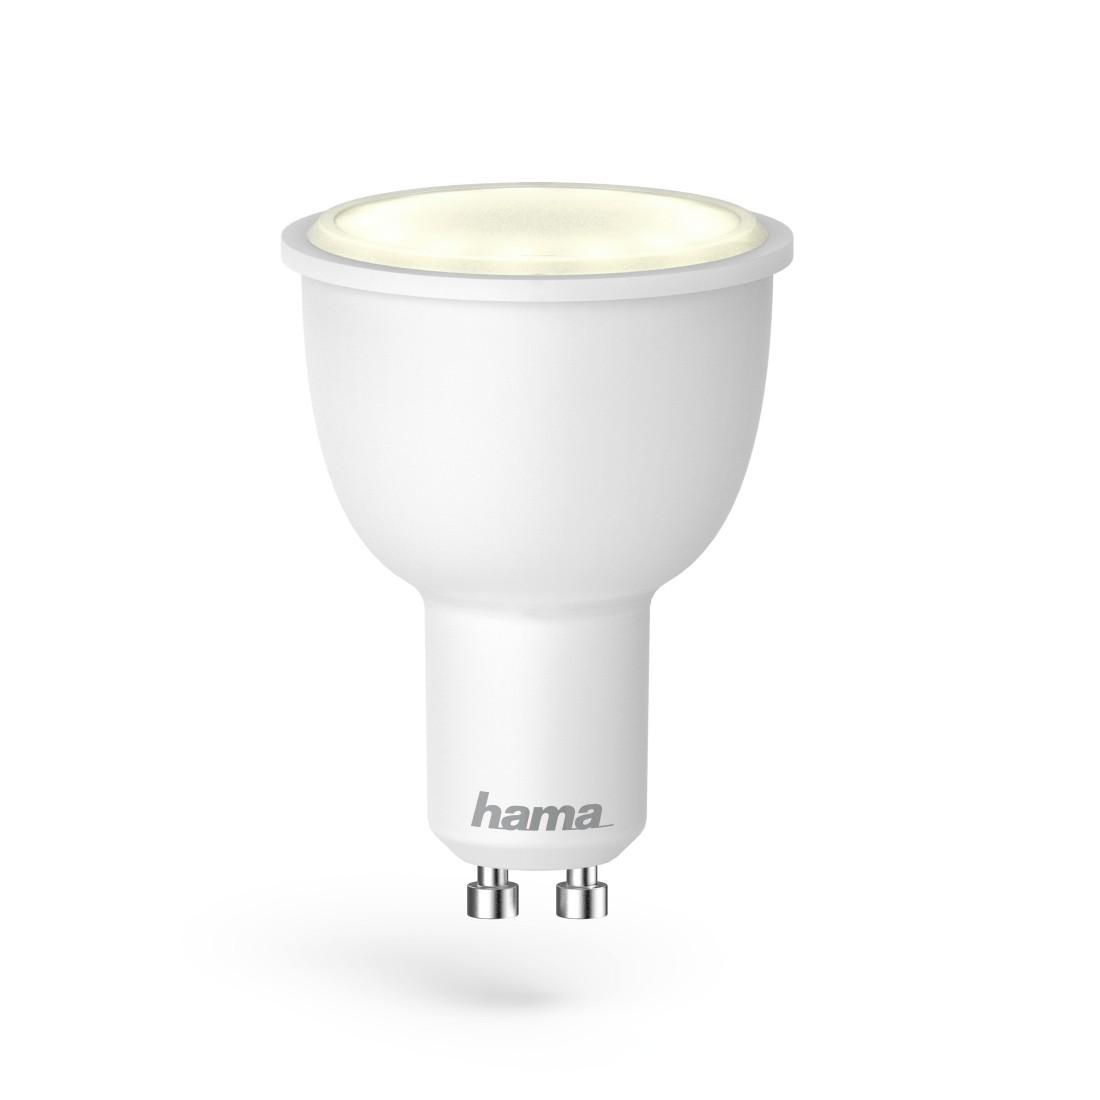 LED крушка XAVAX 176532, Wi-fi, 4,5W, PAR 16, 2700K, димираща, bulb